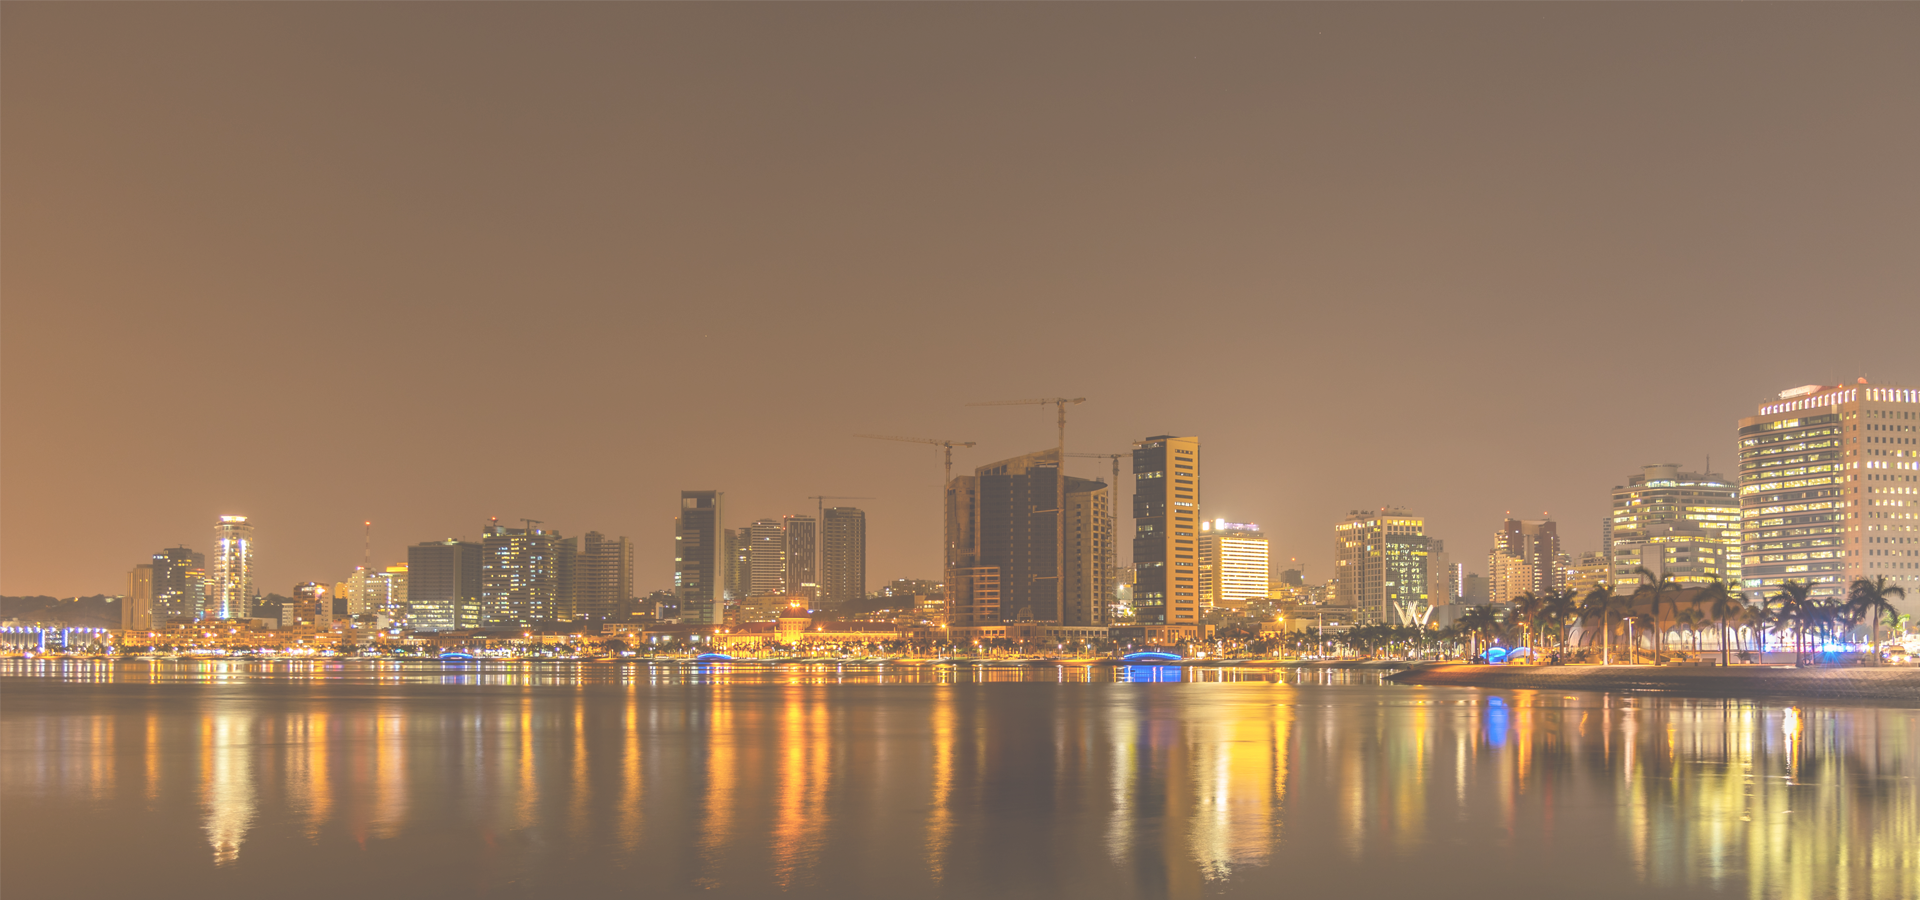 Peer-to-peer advisory in Luanda, Angola